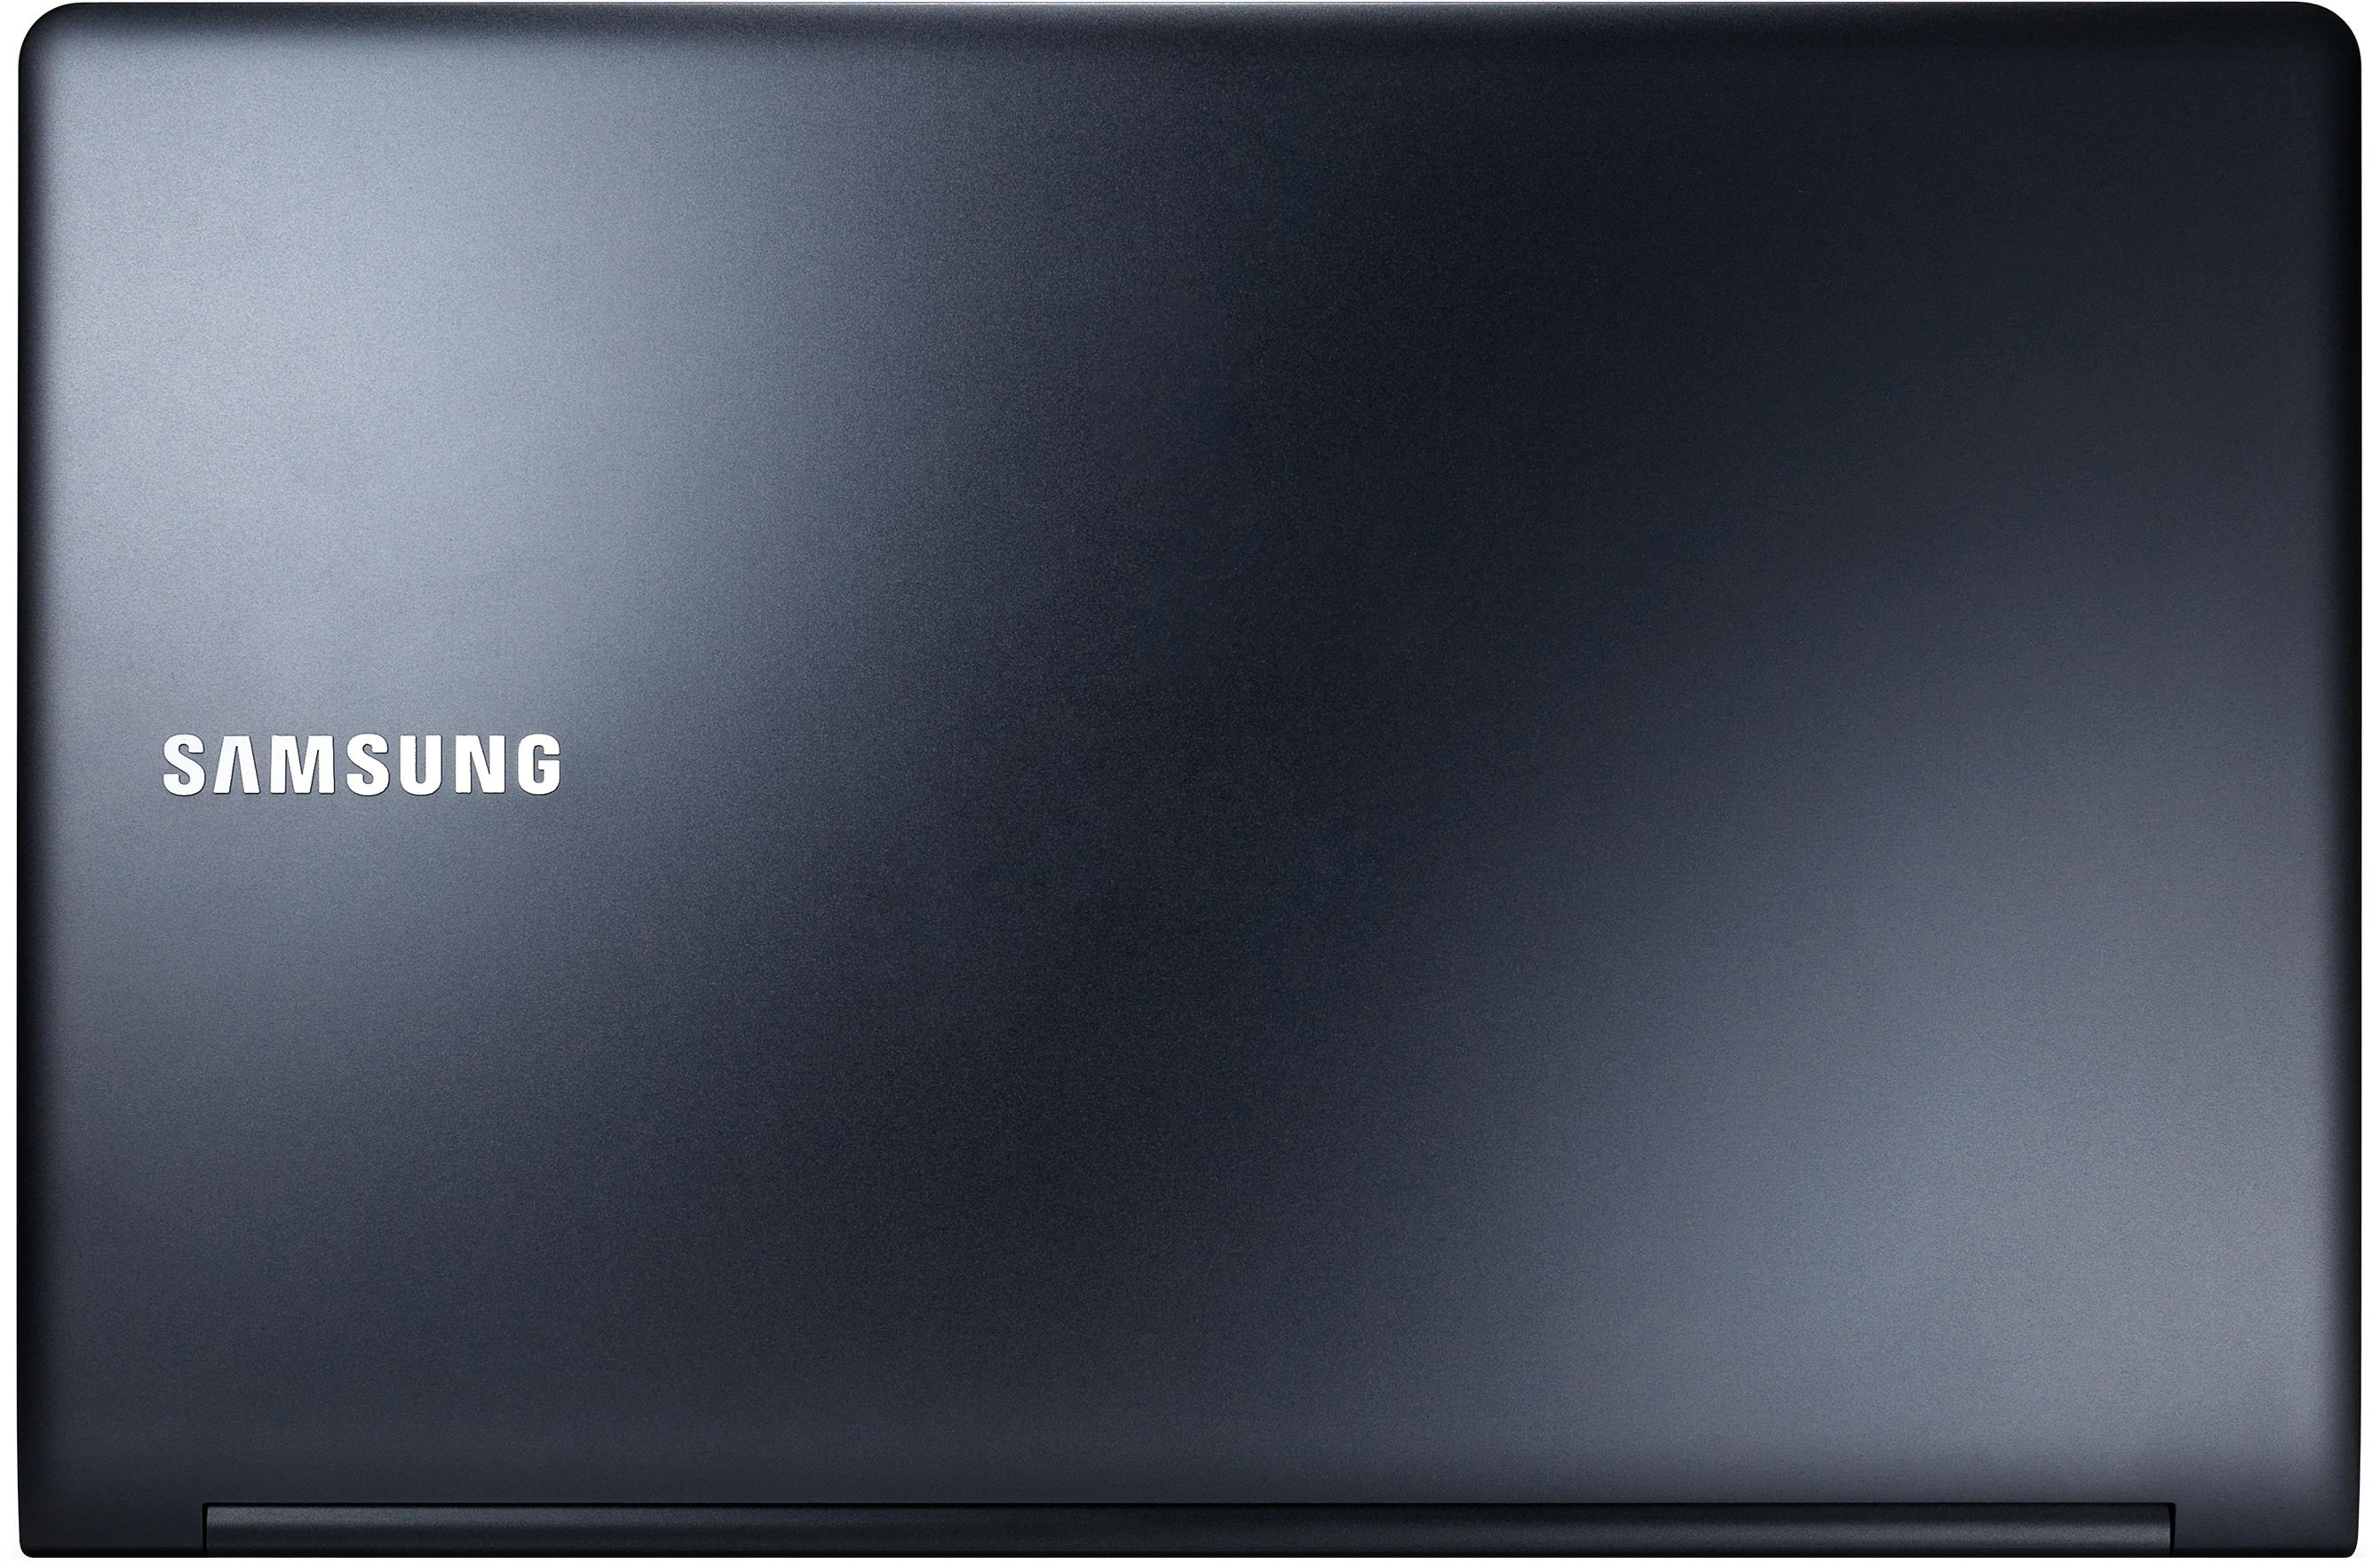 Купить Ноутбук Samsung 900X4C-K01 (NP-900X4C-K01RU) фото 3